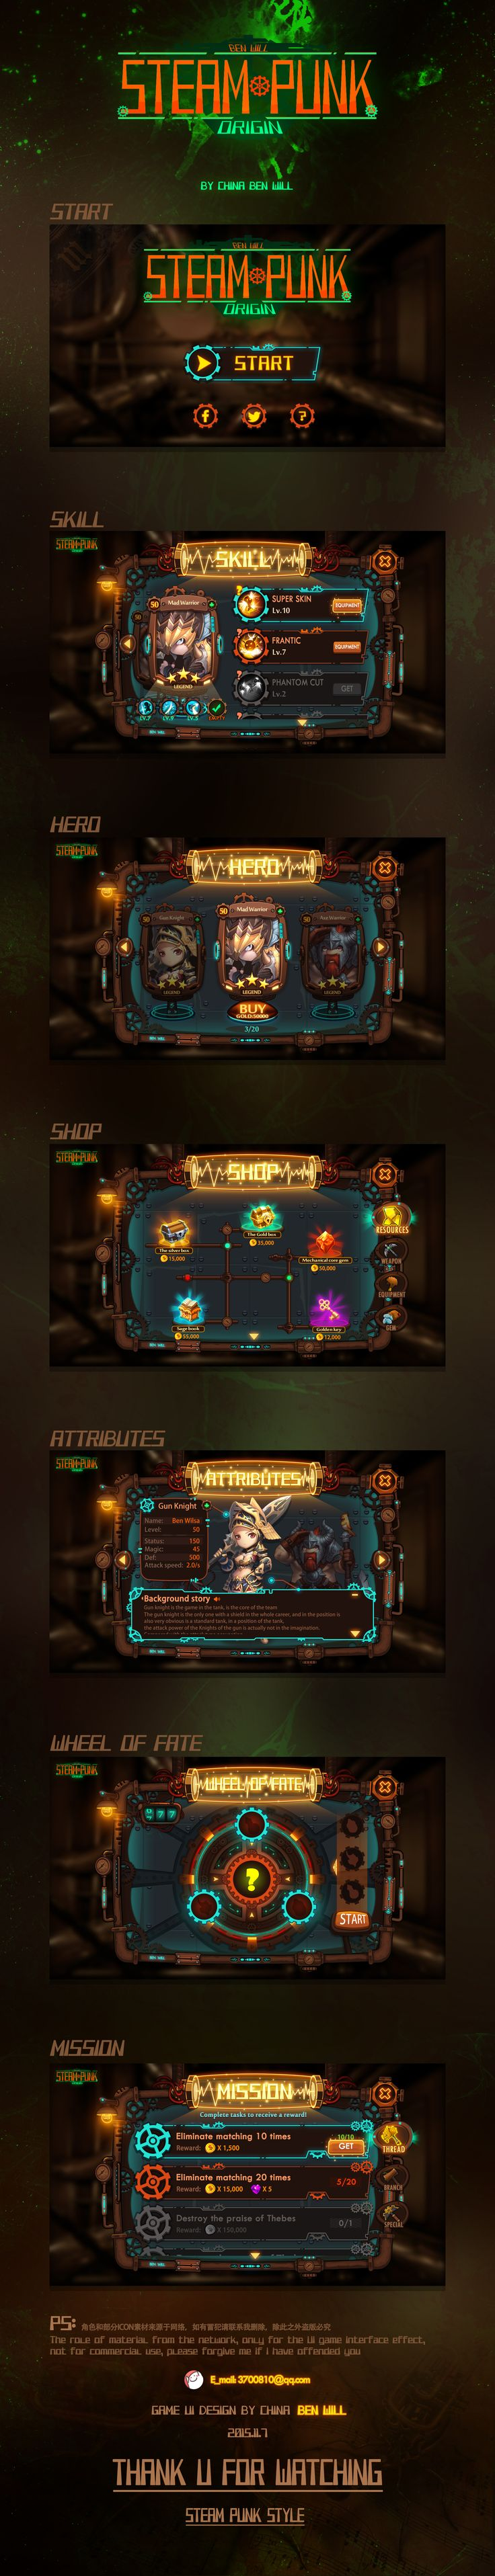 小忙Ben Will Game ui design|蒸汽朋克风游戏UI|蒸汽朋克|Steampunk|Steam…